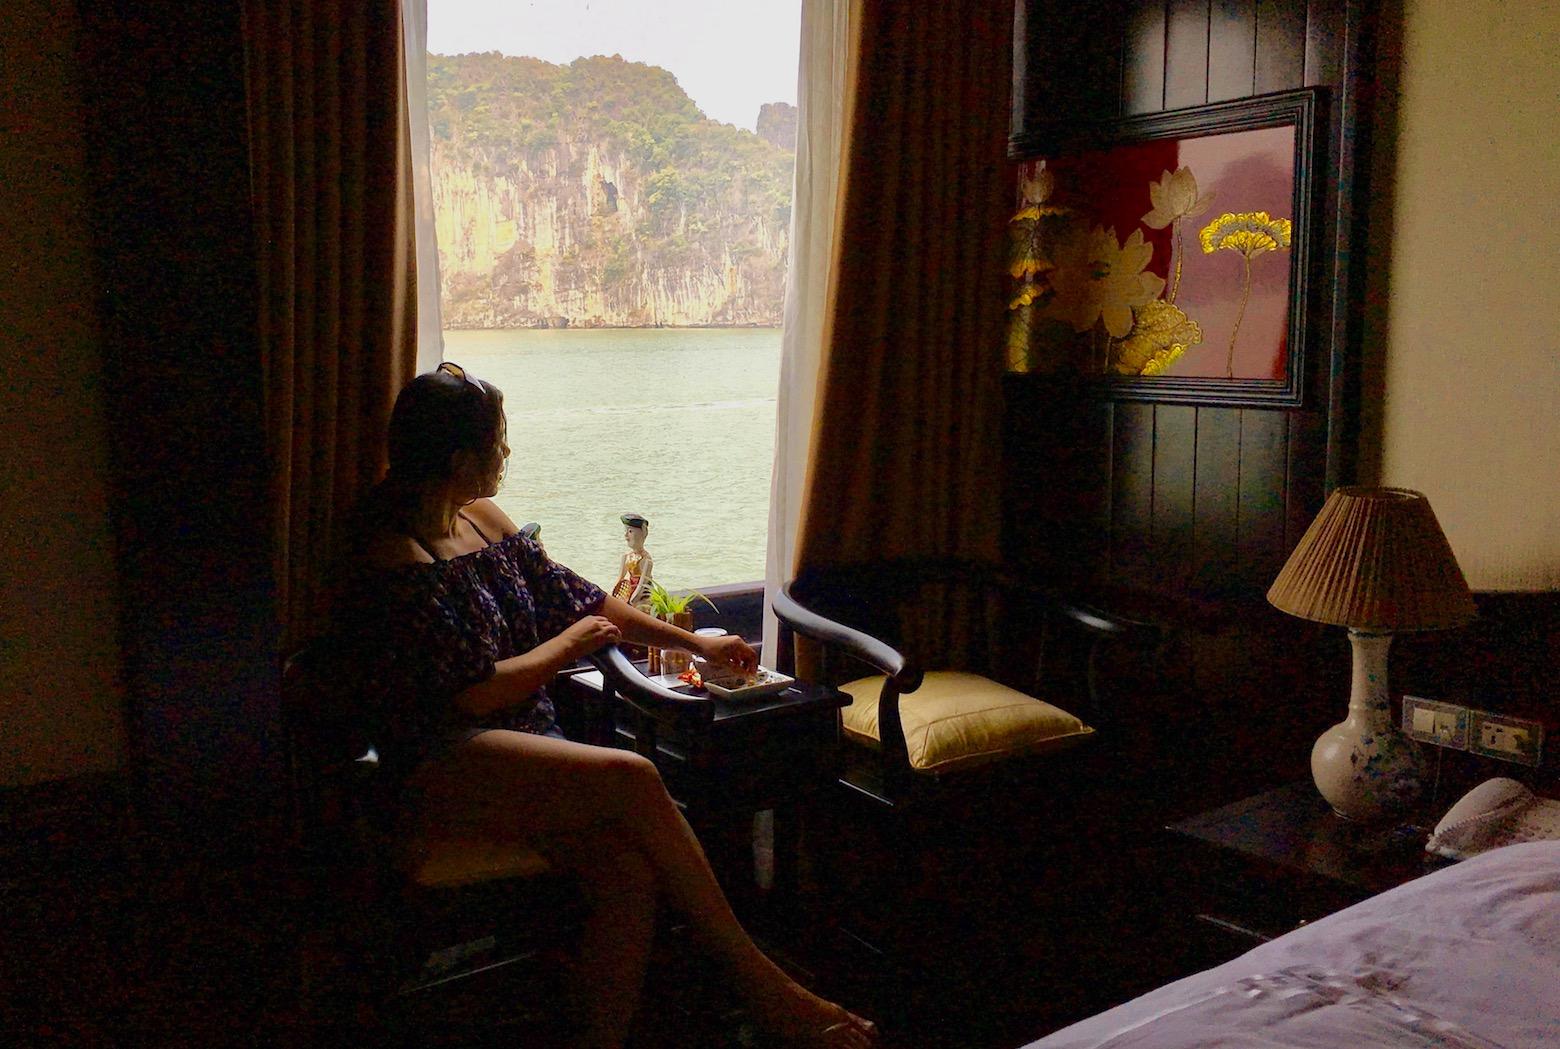 Dragon Legend Cruise, Bai Tu Long, Vietnam. Photo: David Mattatia